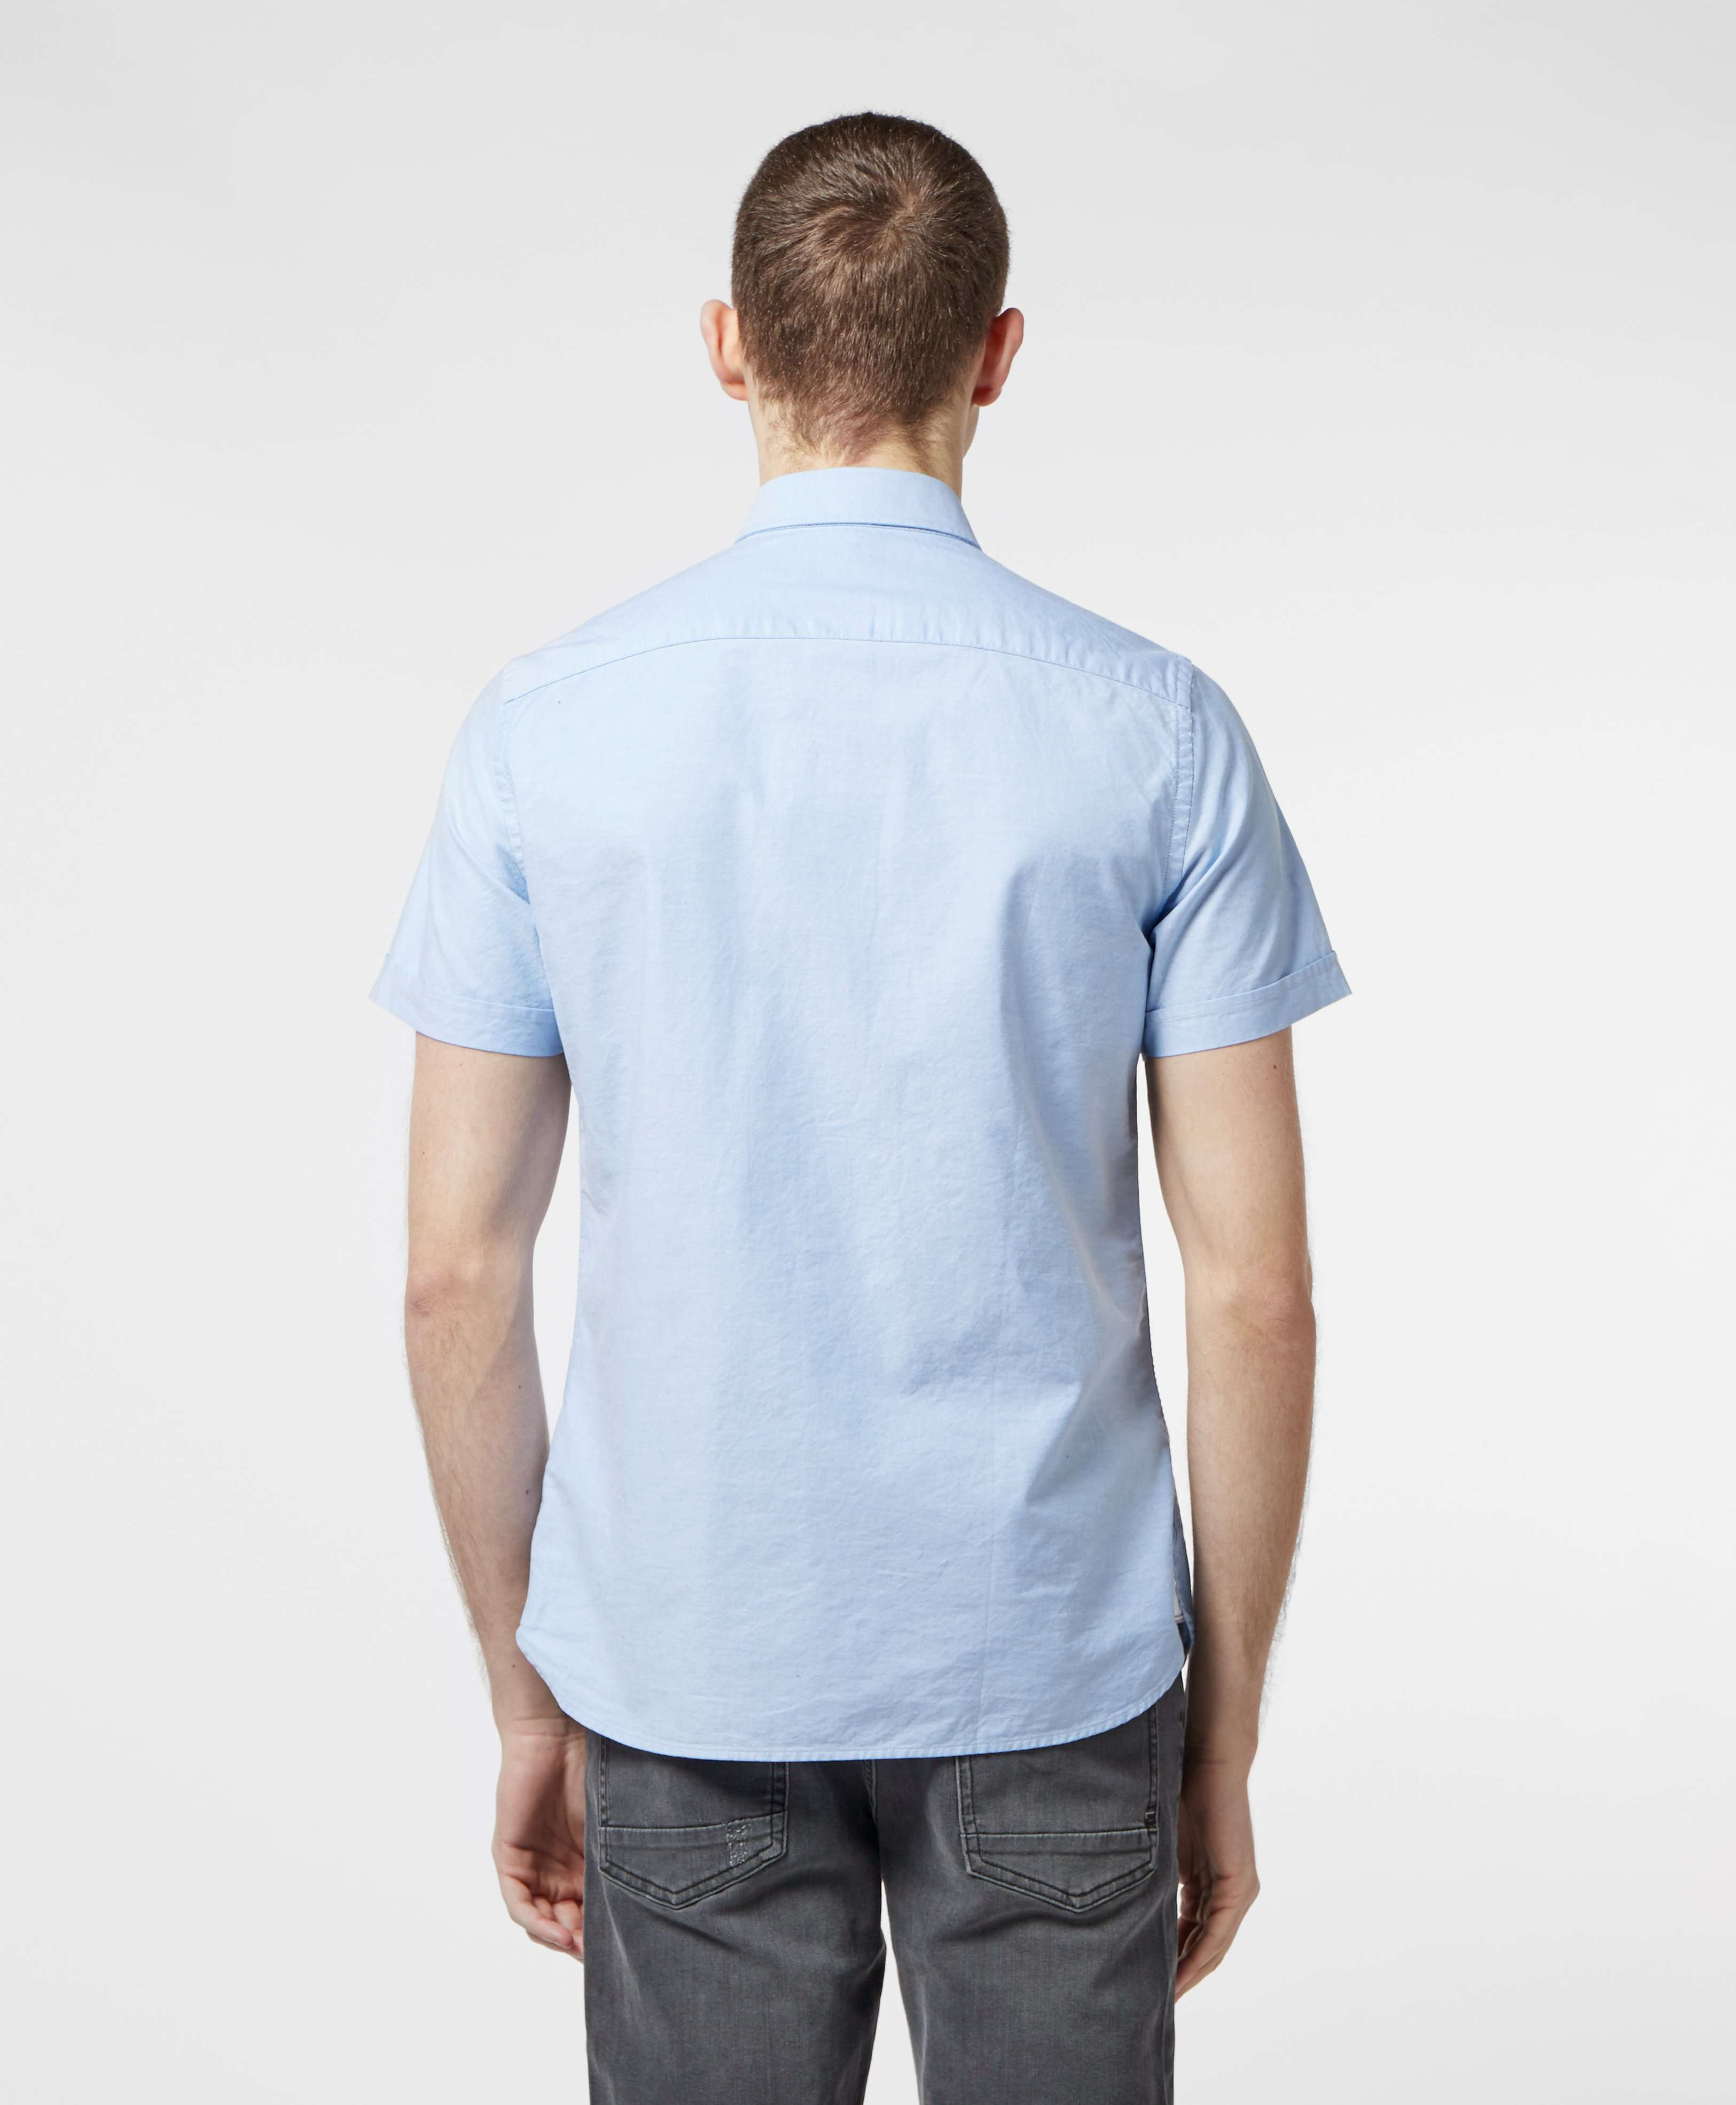 Tommy Hilfiger Short Sleeve Oxford Shirt